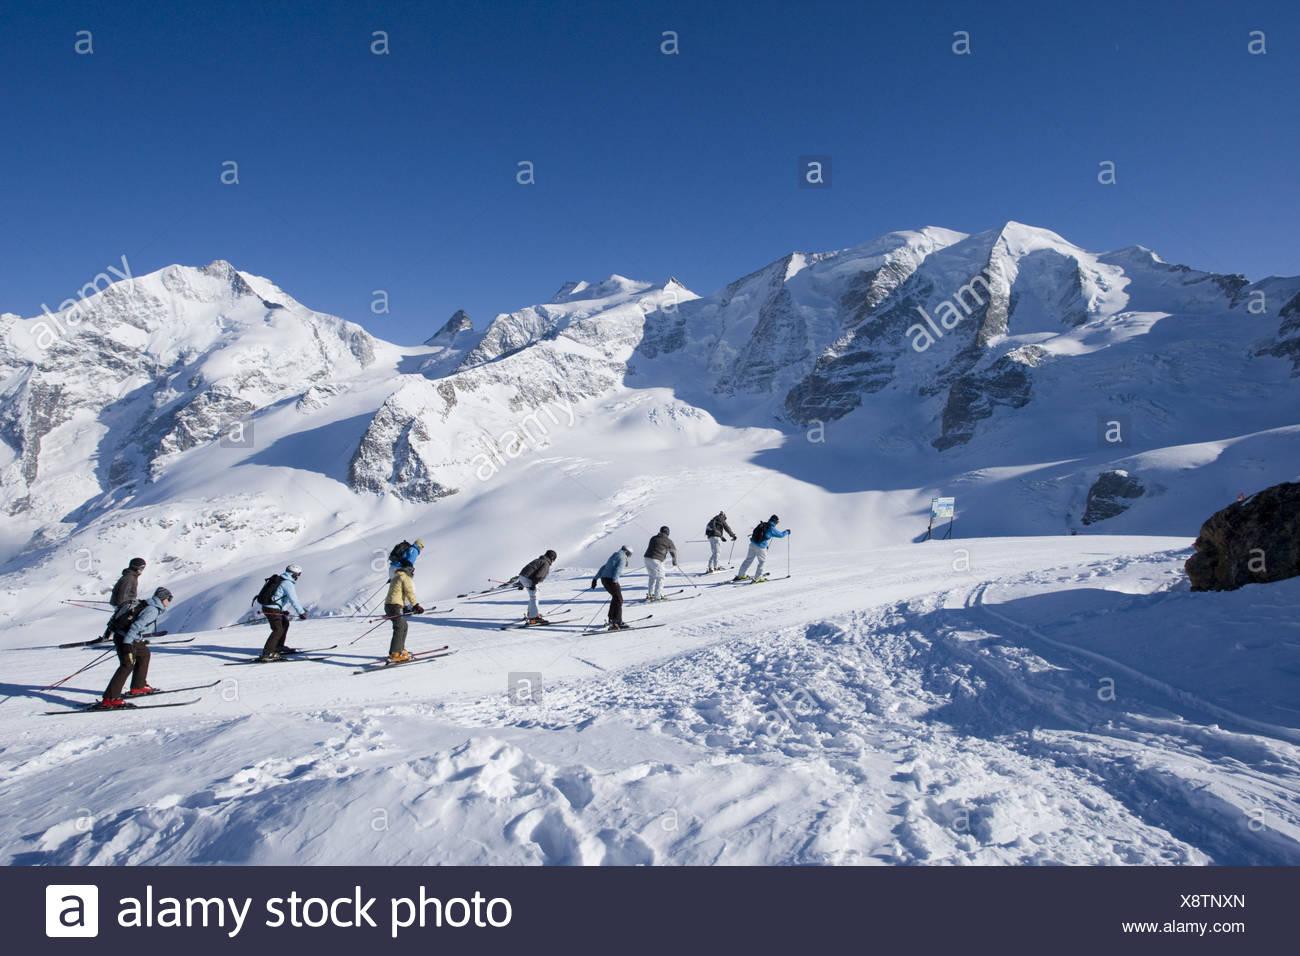 Switzerland, the Engadine, Bernina group, Diavolezza, skiing area, runway, increase, skier, - Stock Image